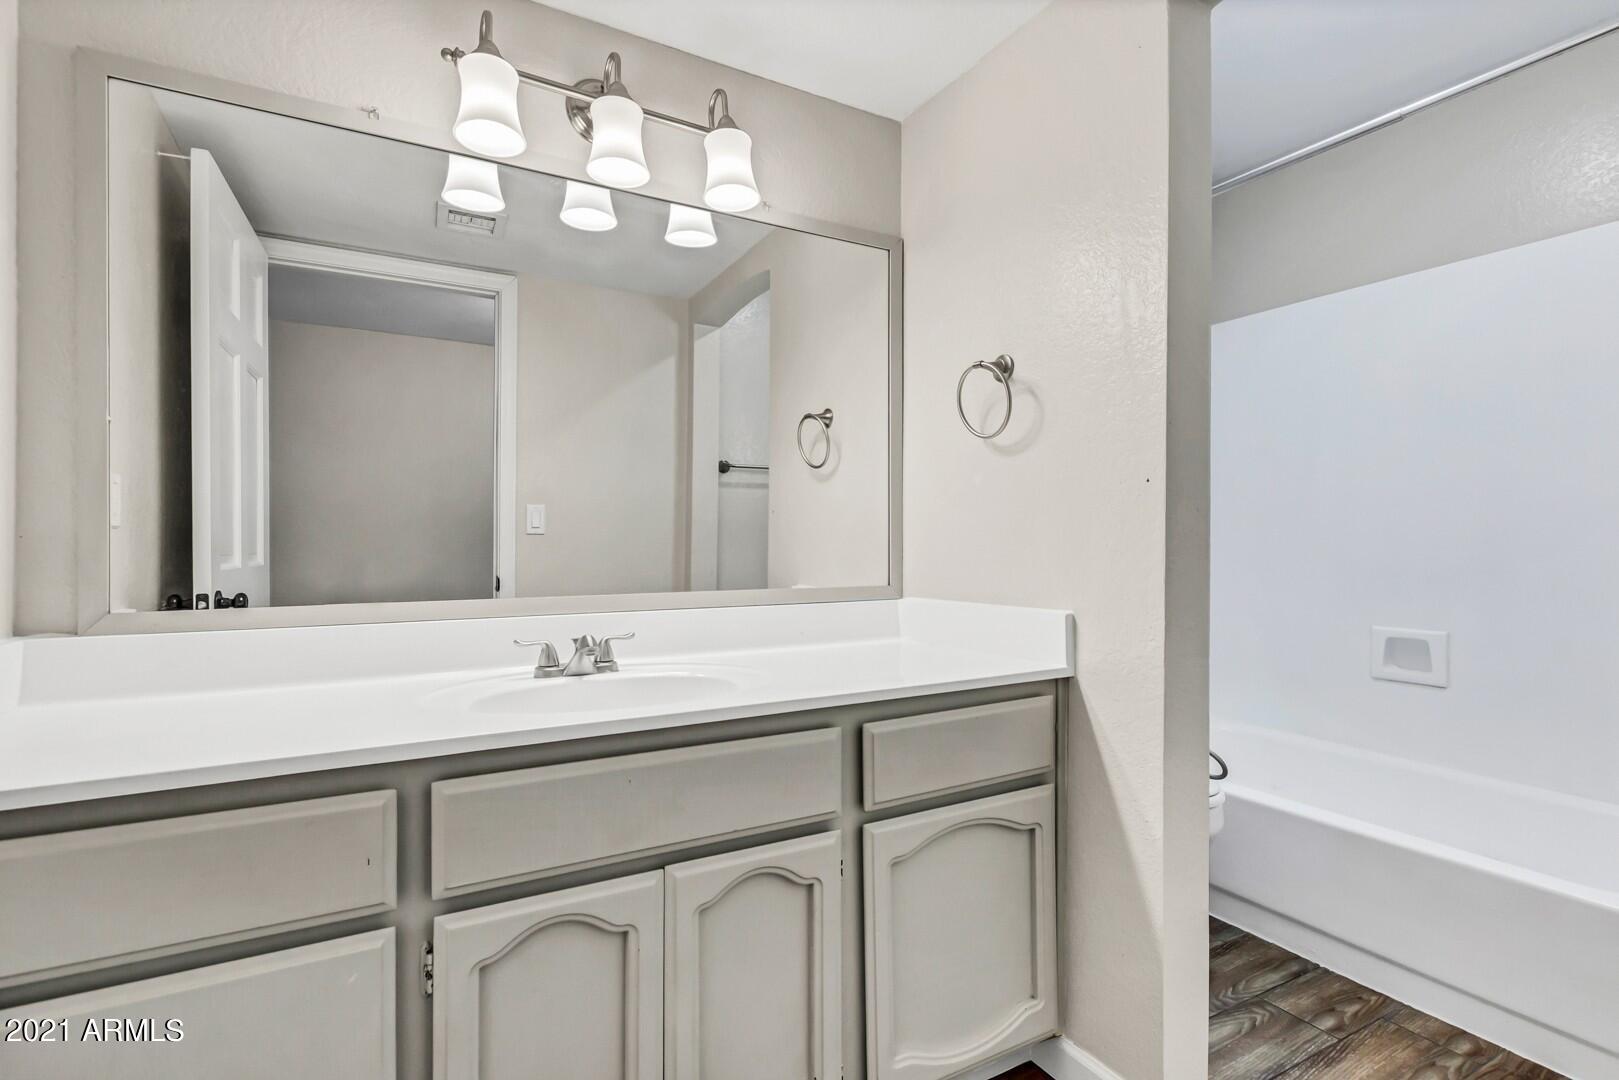 MLS 6307315 241 E TREMAINE Avenue, Gilbert, AZ 85234 Eco-Friendly Homes